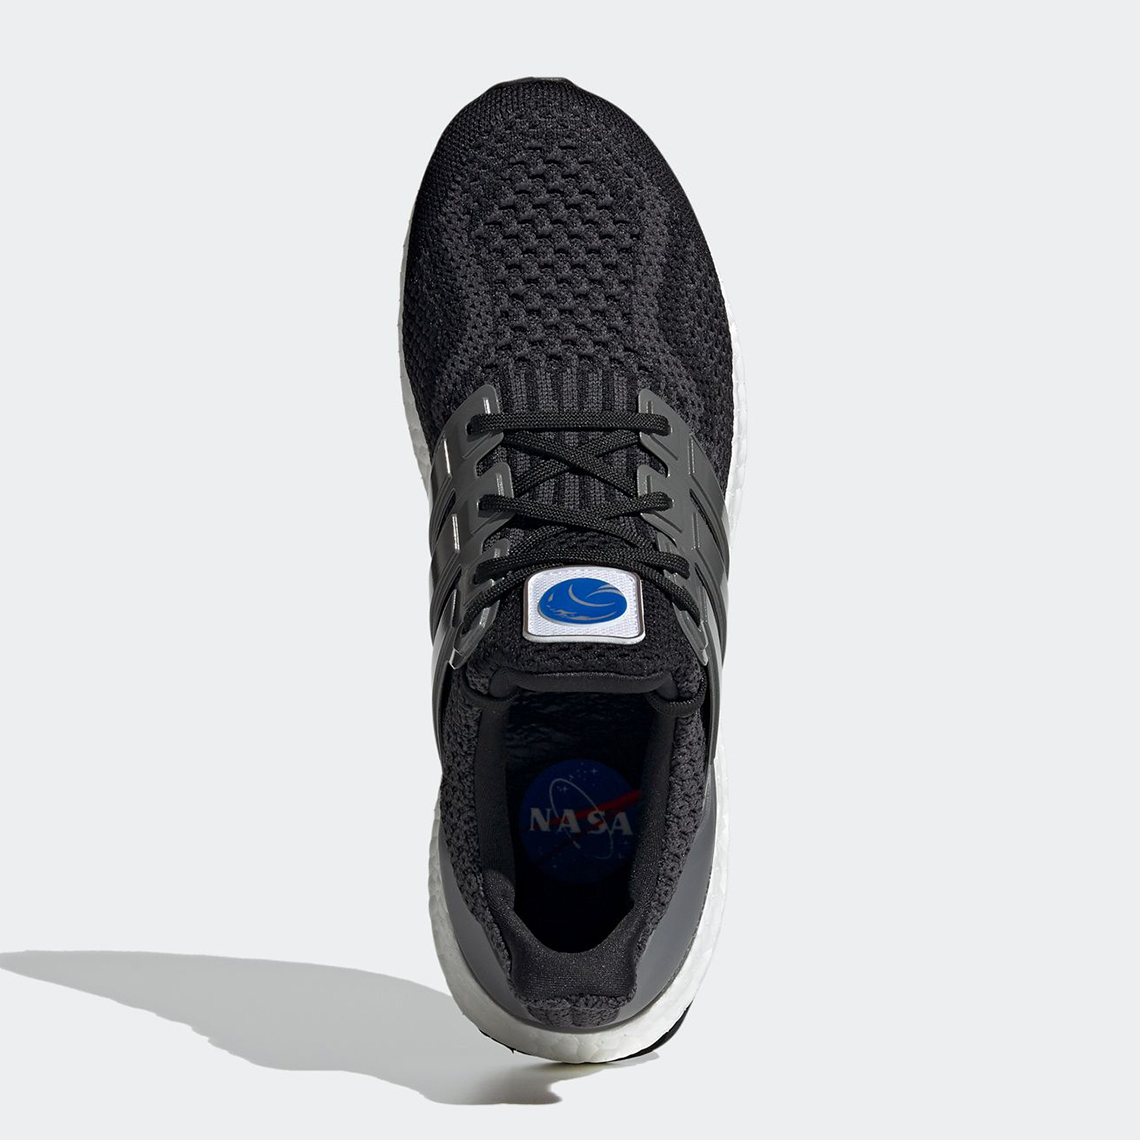 adidas-ultra-boost-nasa-black-FZ1855-5.jpg?w=1140